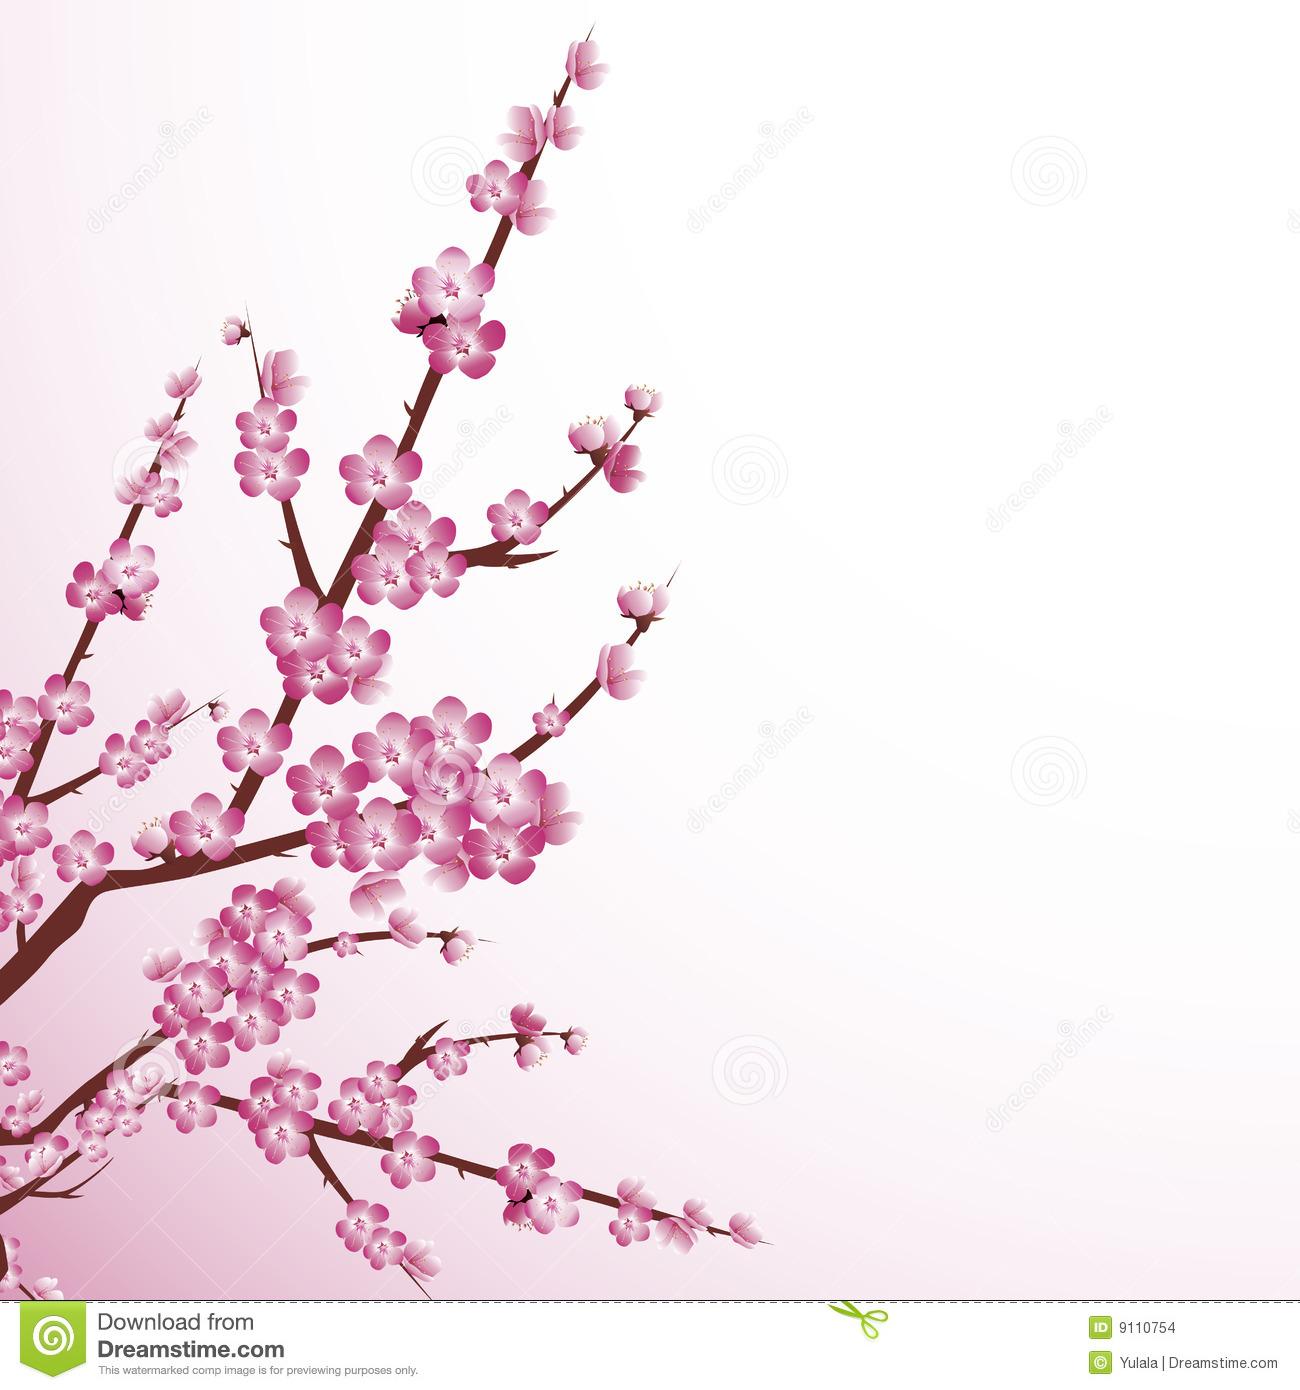 Sakura Blossom clipart powerpoint background #13